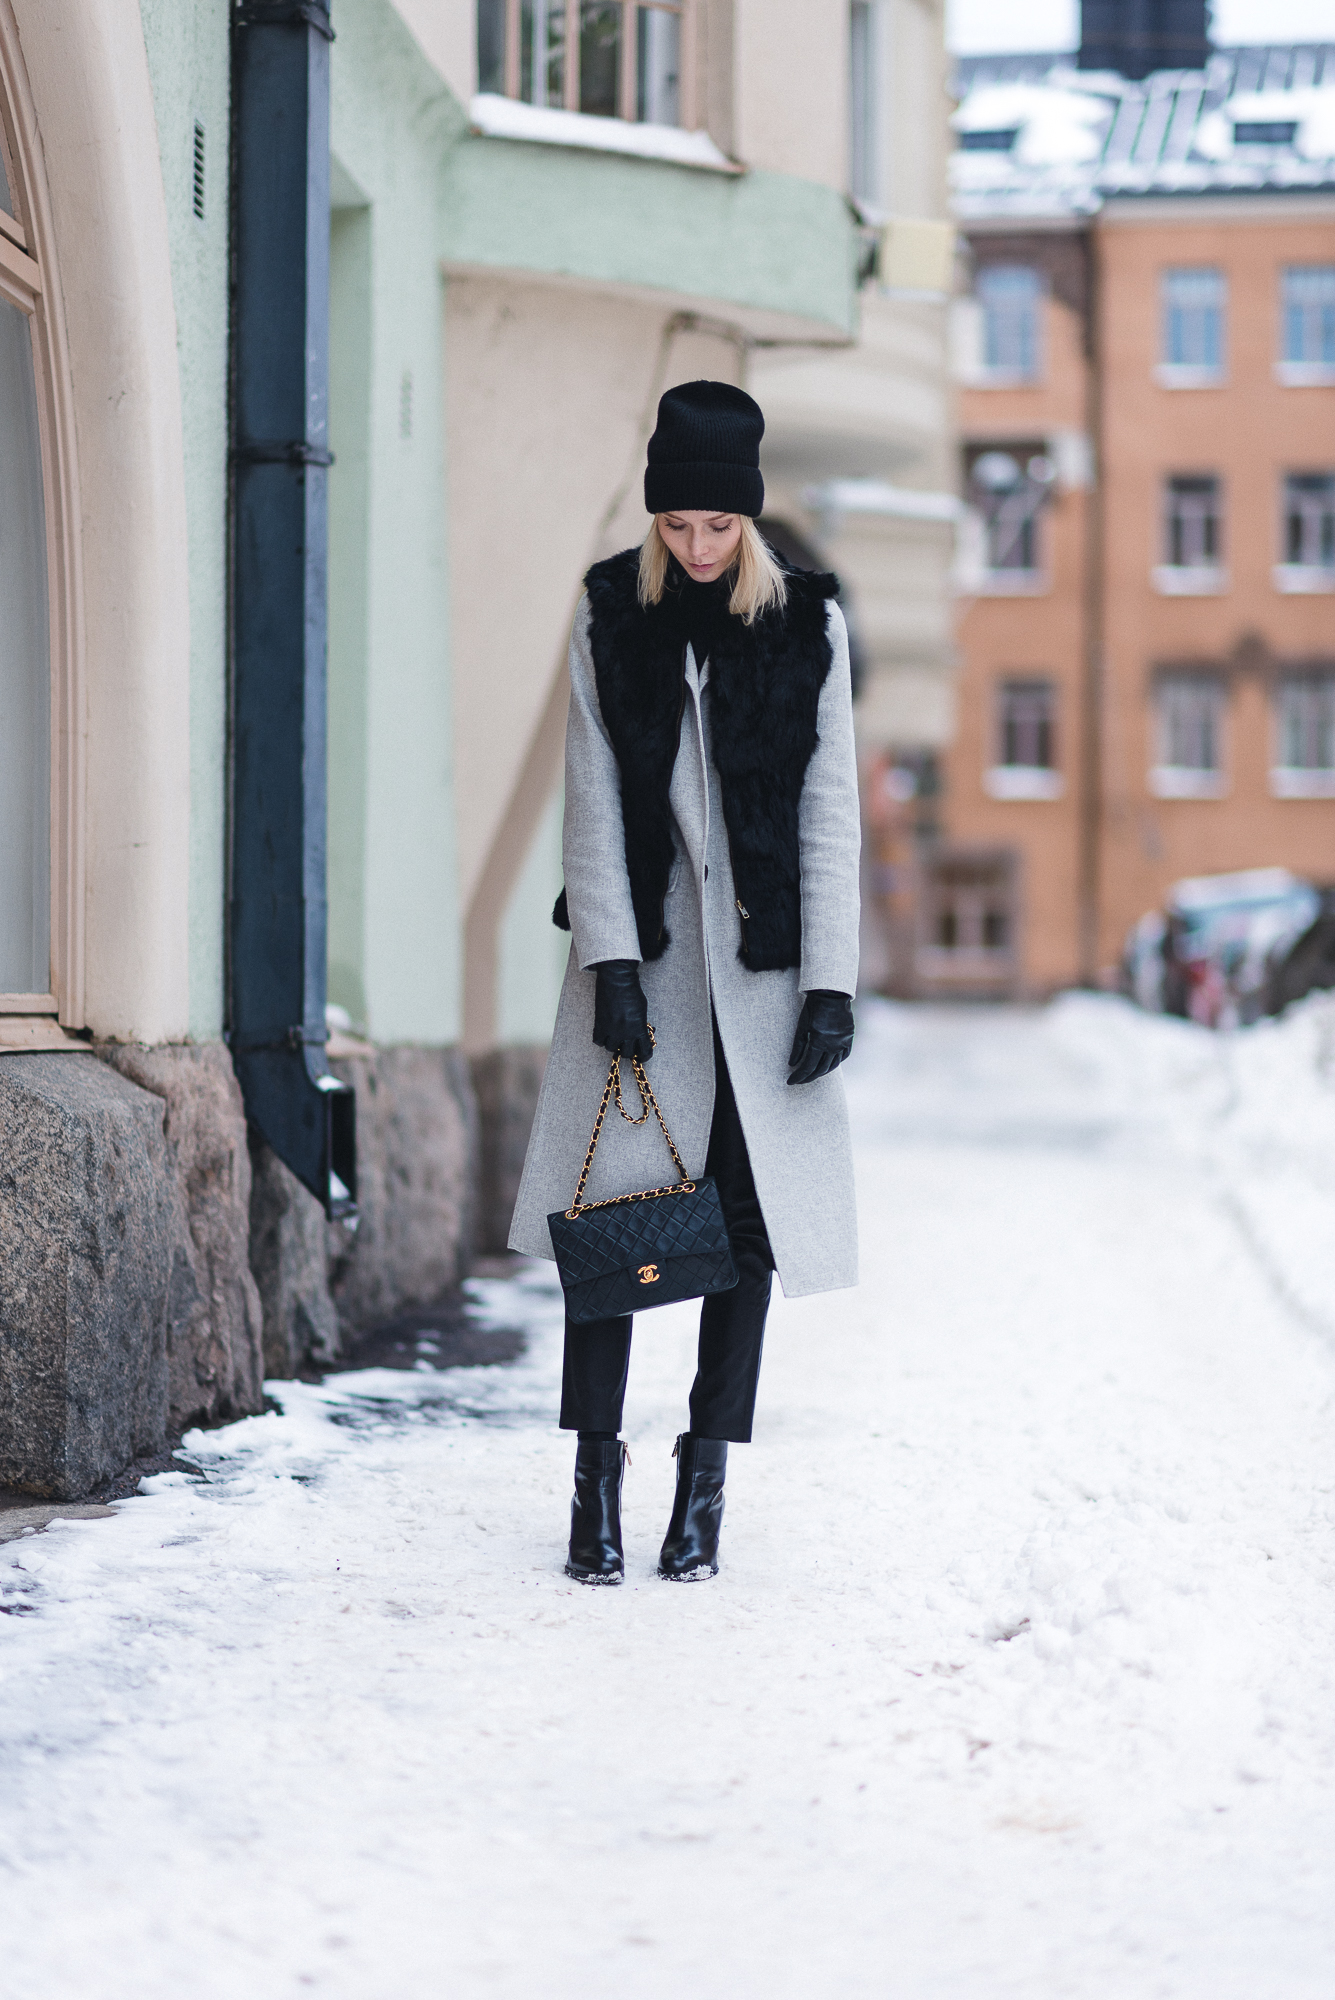 anna-sofia-helsinki-snow-chanel-bag-black-beanie-3